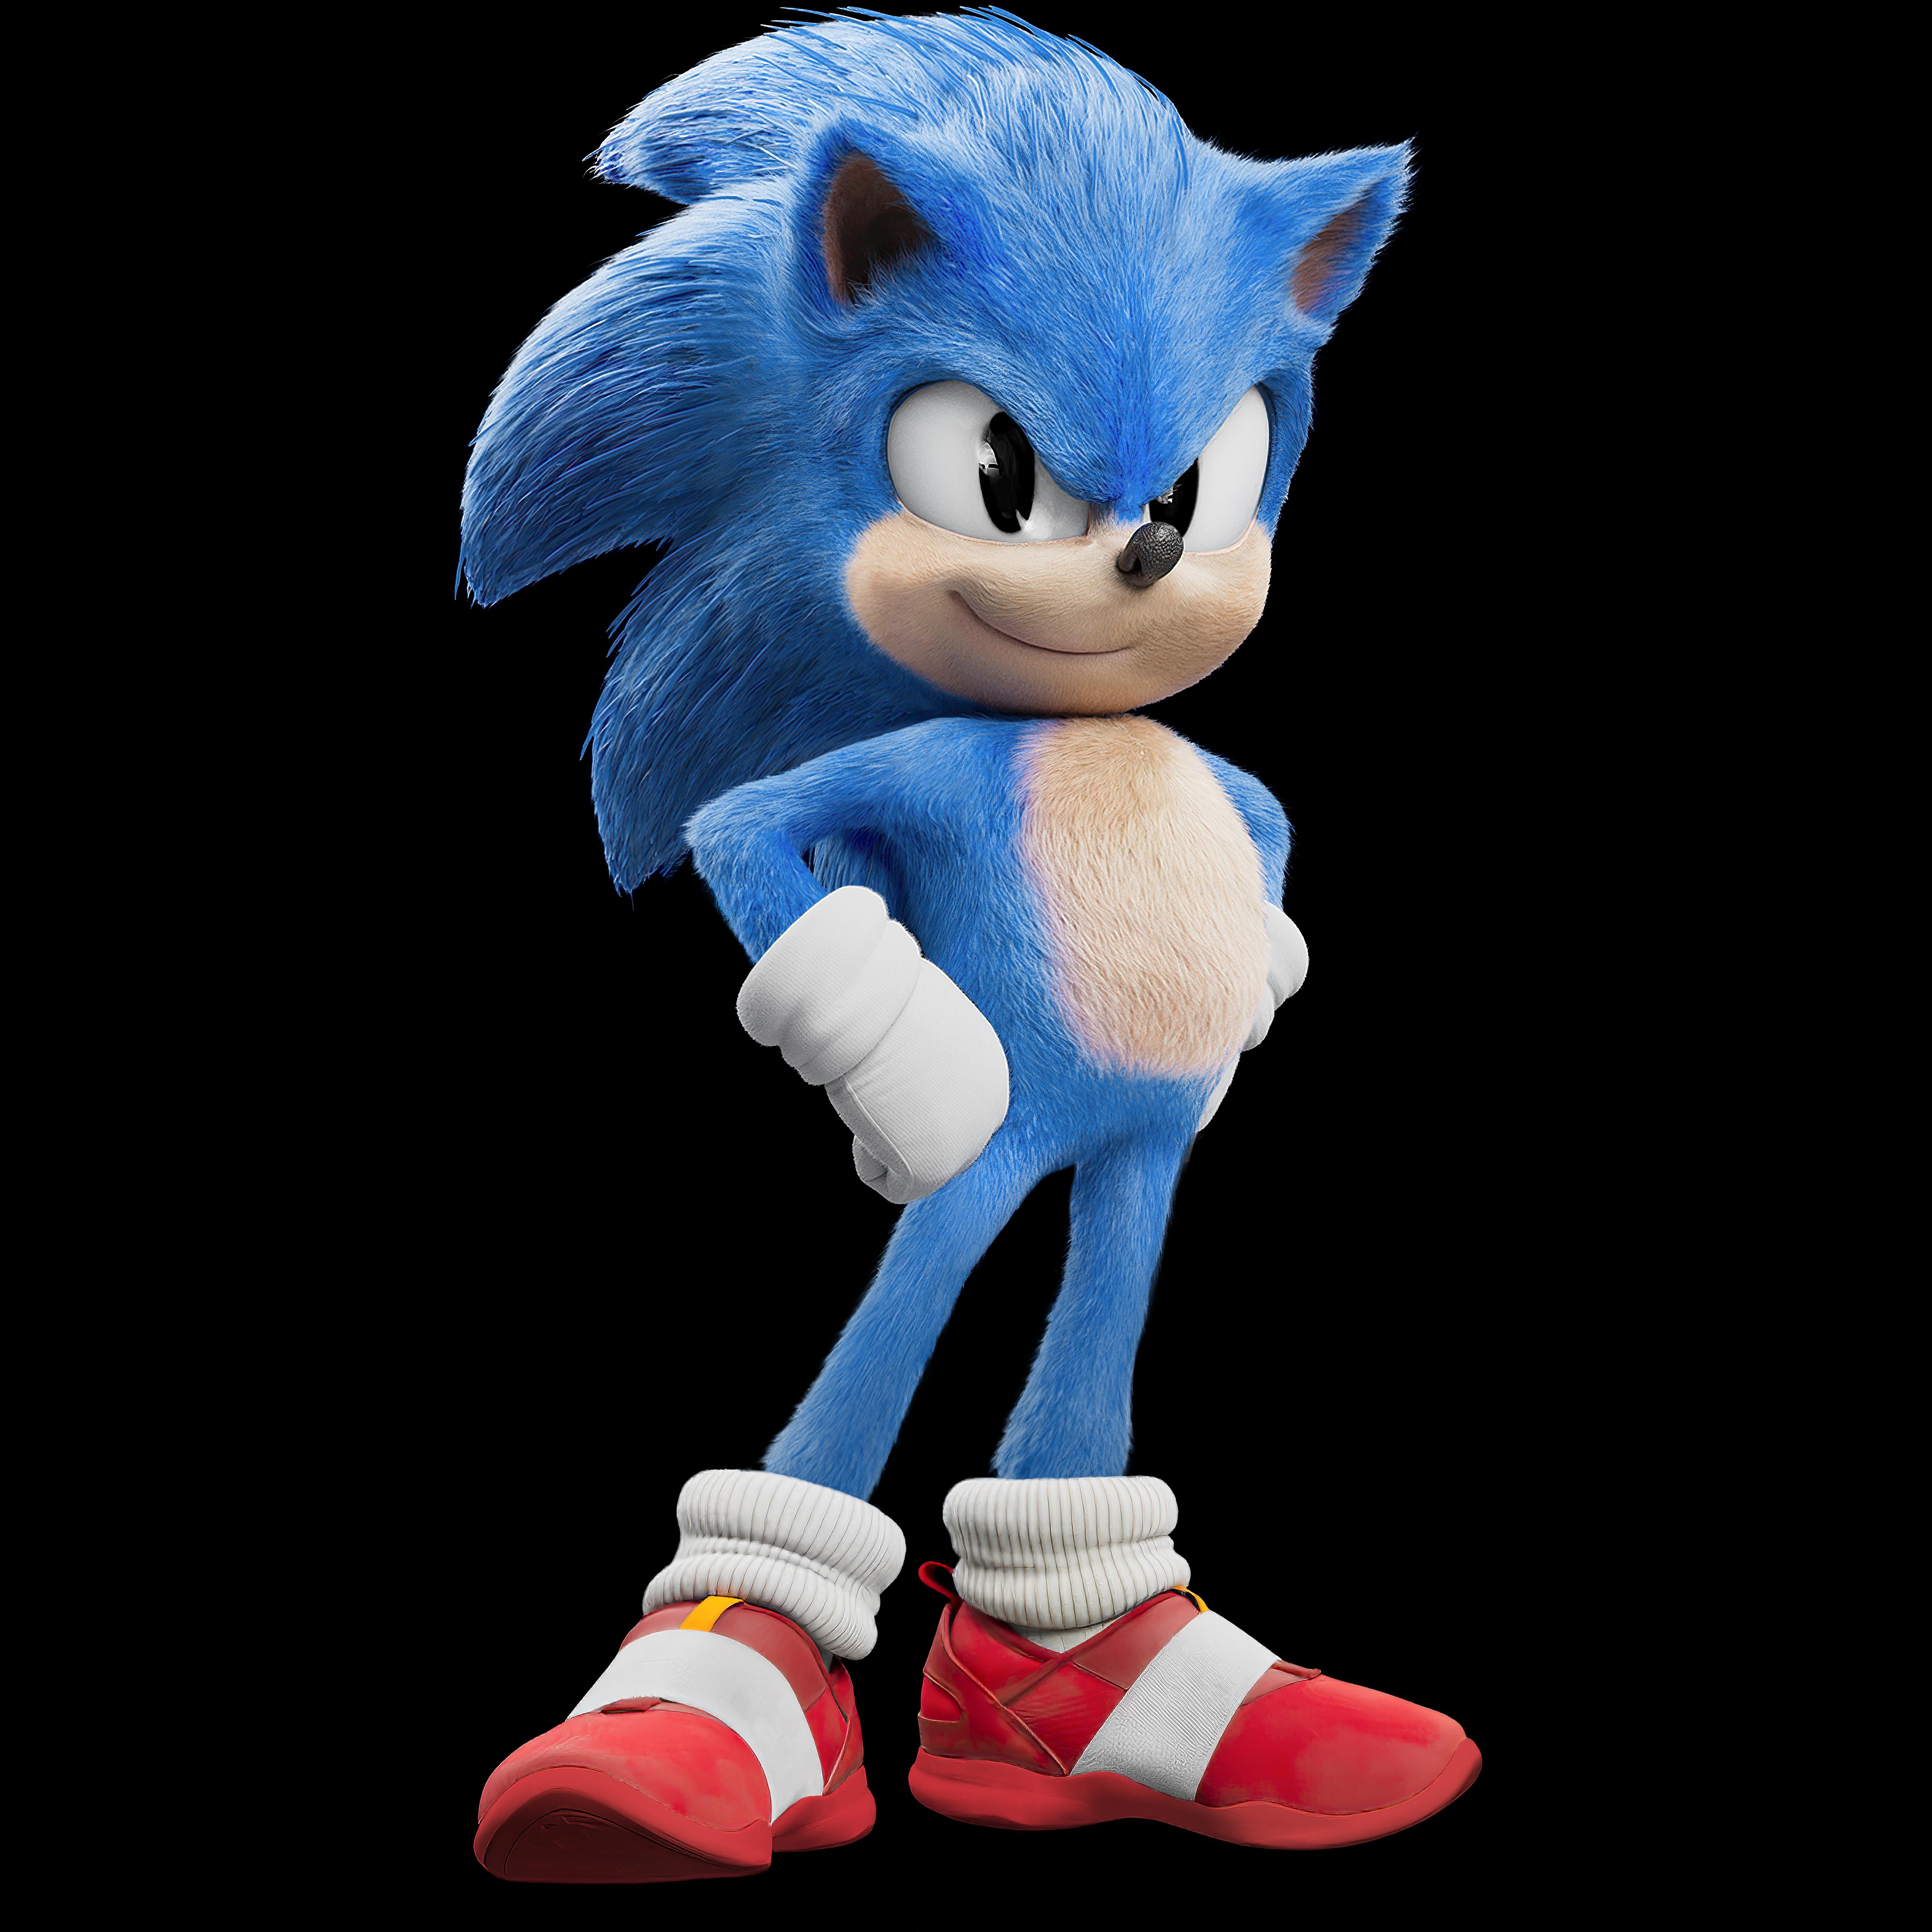 Classic Sonic Sonic The Movie Speededit Sonic The Movie Sonic Hedgehog Movie